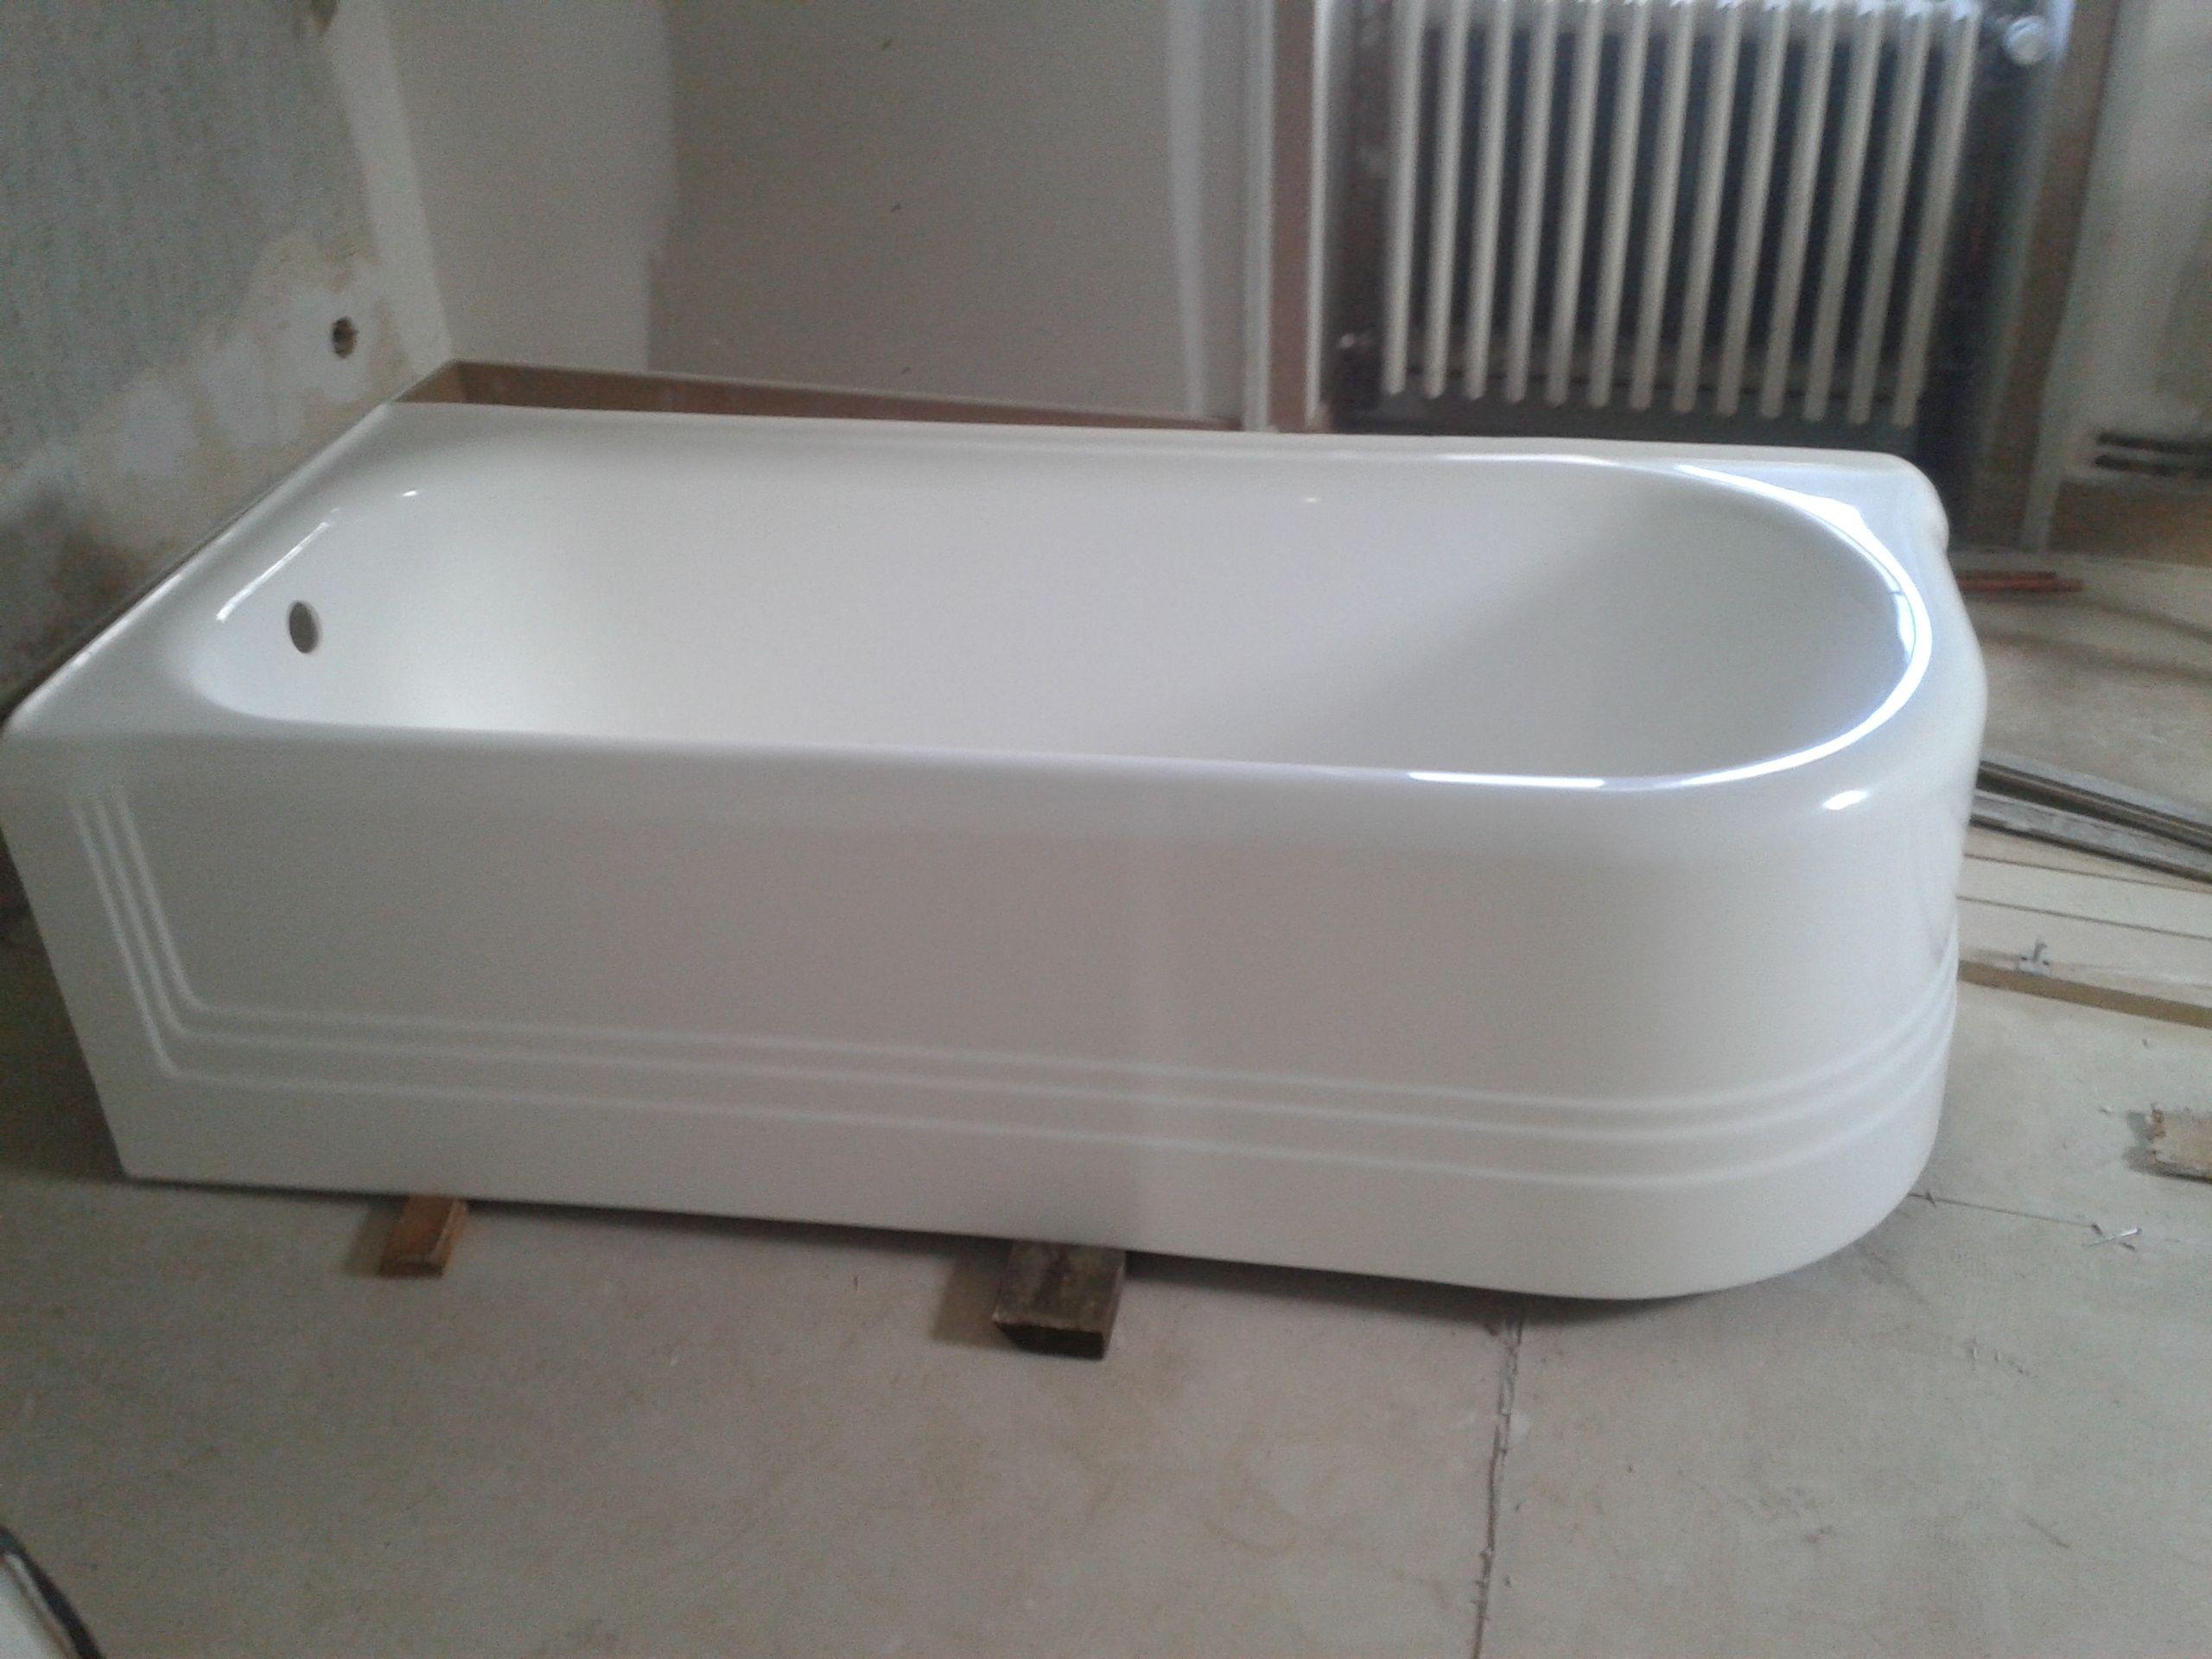 rsultats google recherche dimages with baignoire fonte occasion. Black Bedroom Furniture Sets. Home Design Ideas